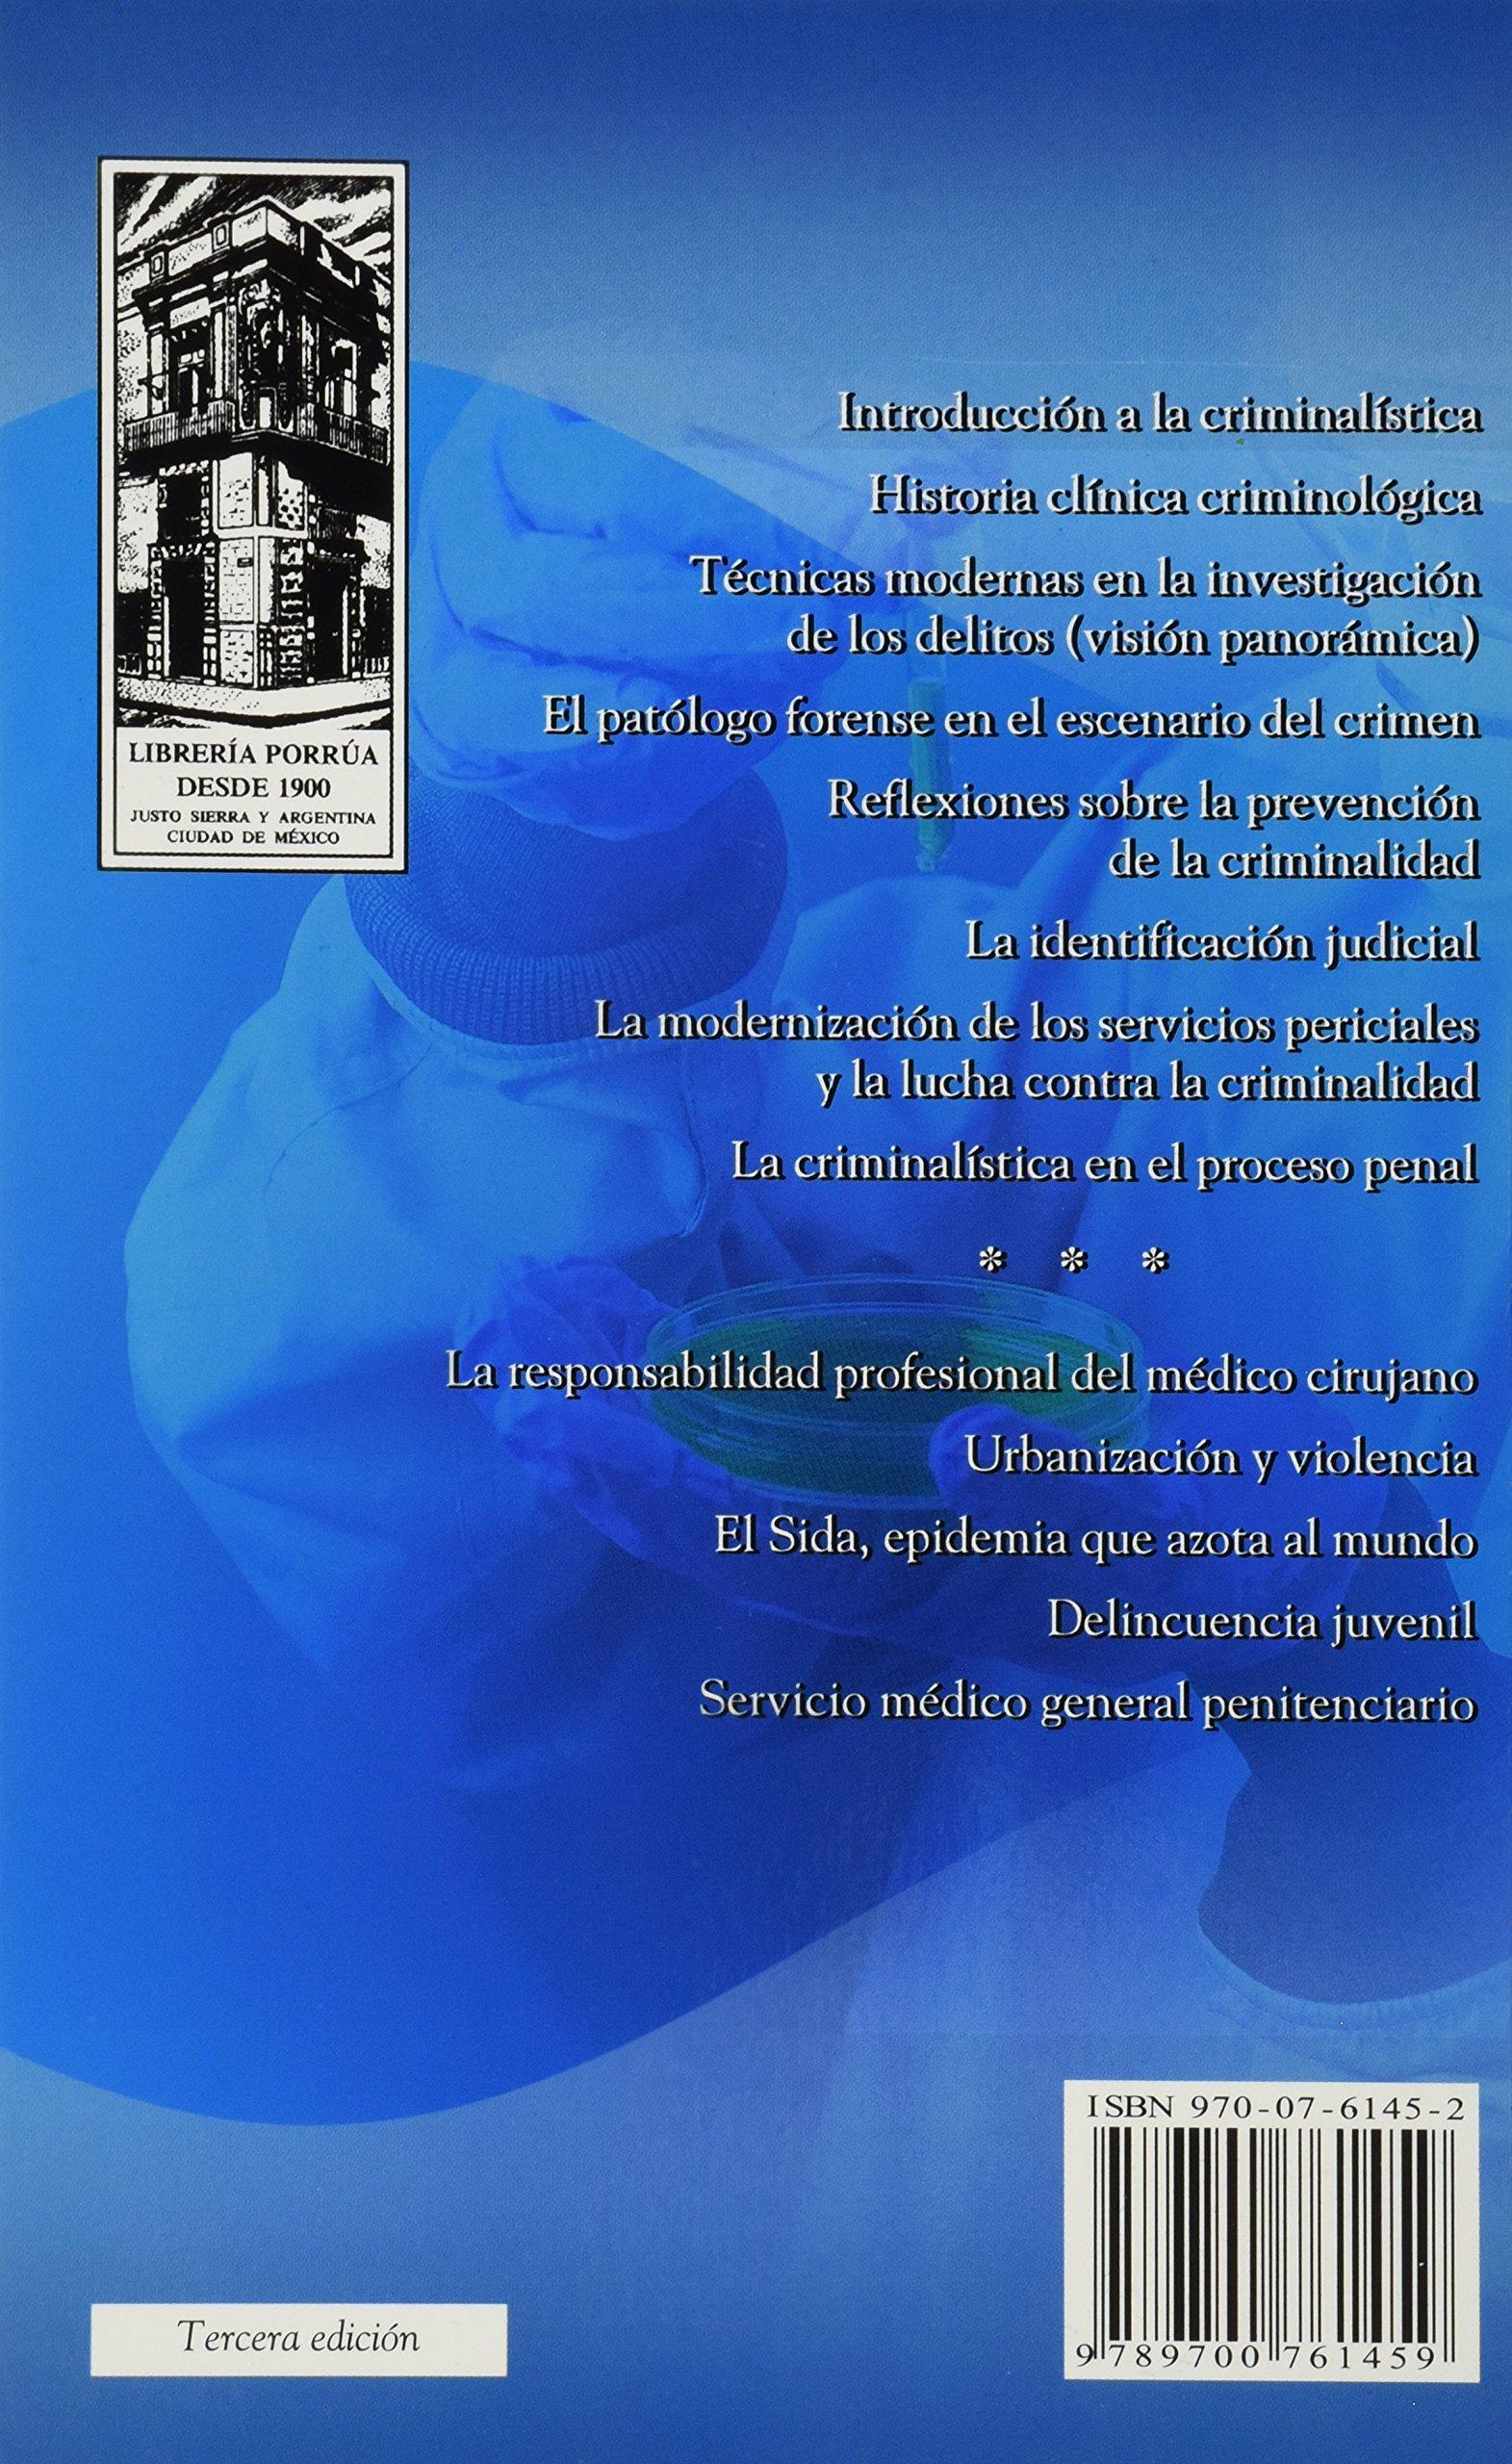 NOTAS DE UN CRIMINALISTA: RAFAEL L. MORENO GONZALEZ: 9789700761459: Amazon.com: Books